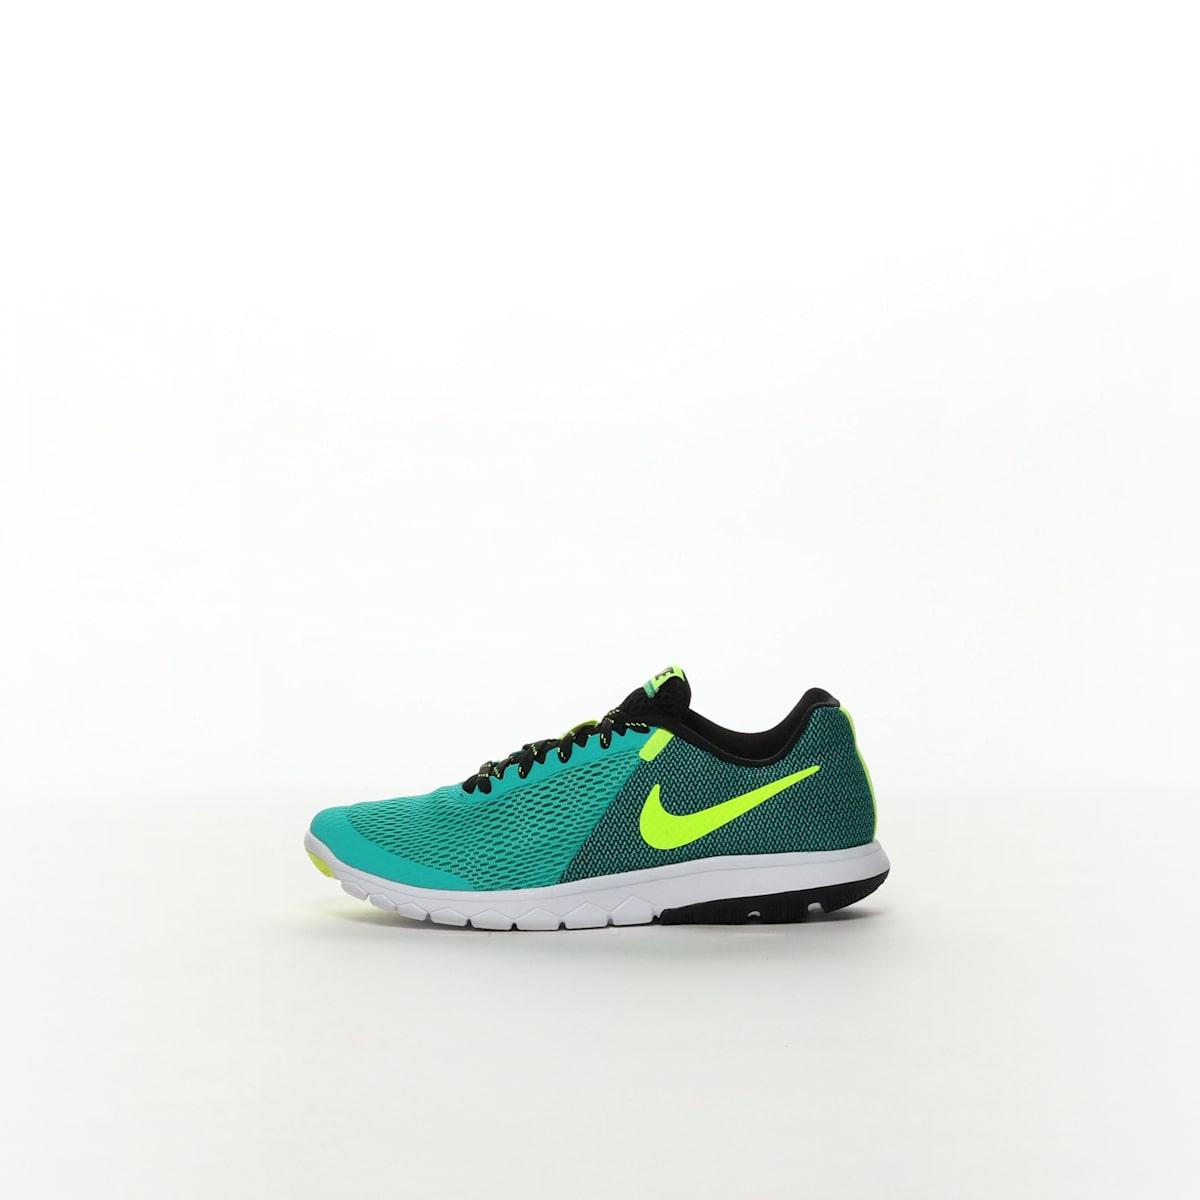 Women s Nike Flex Experience RN 5 Running Shoe - CLRJAD VOLT – Resku 8dd0e7b9c